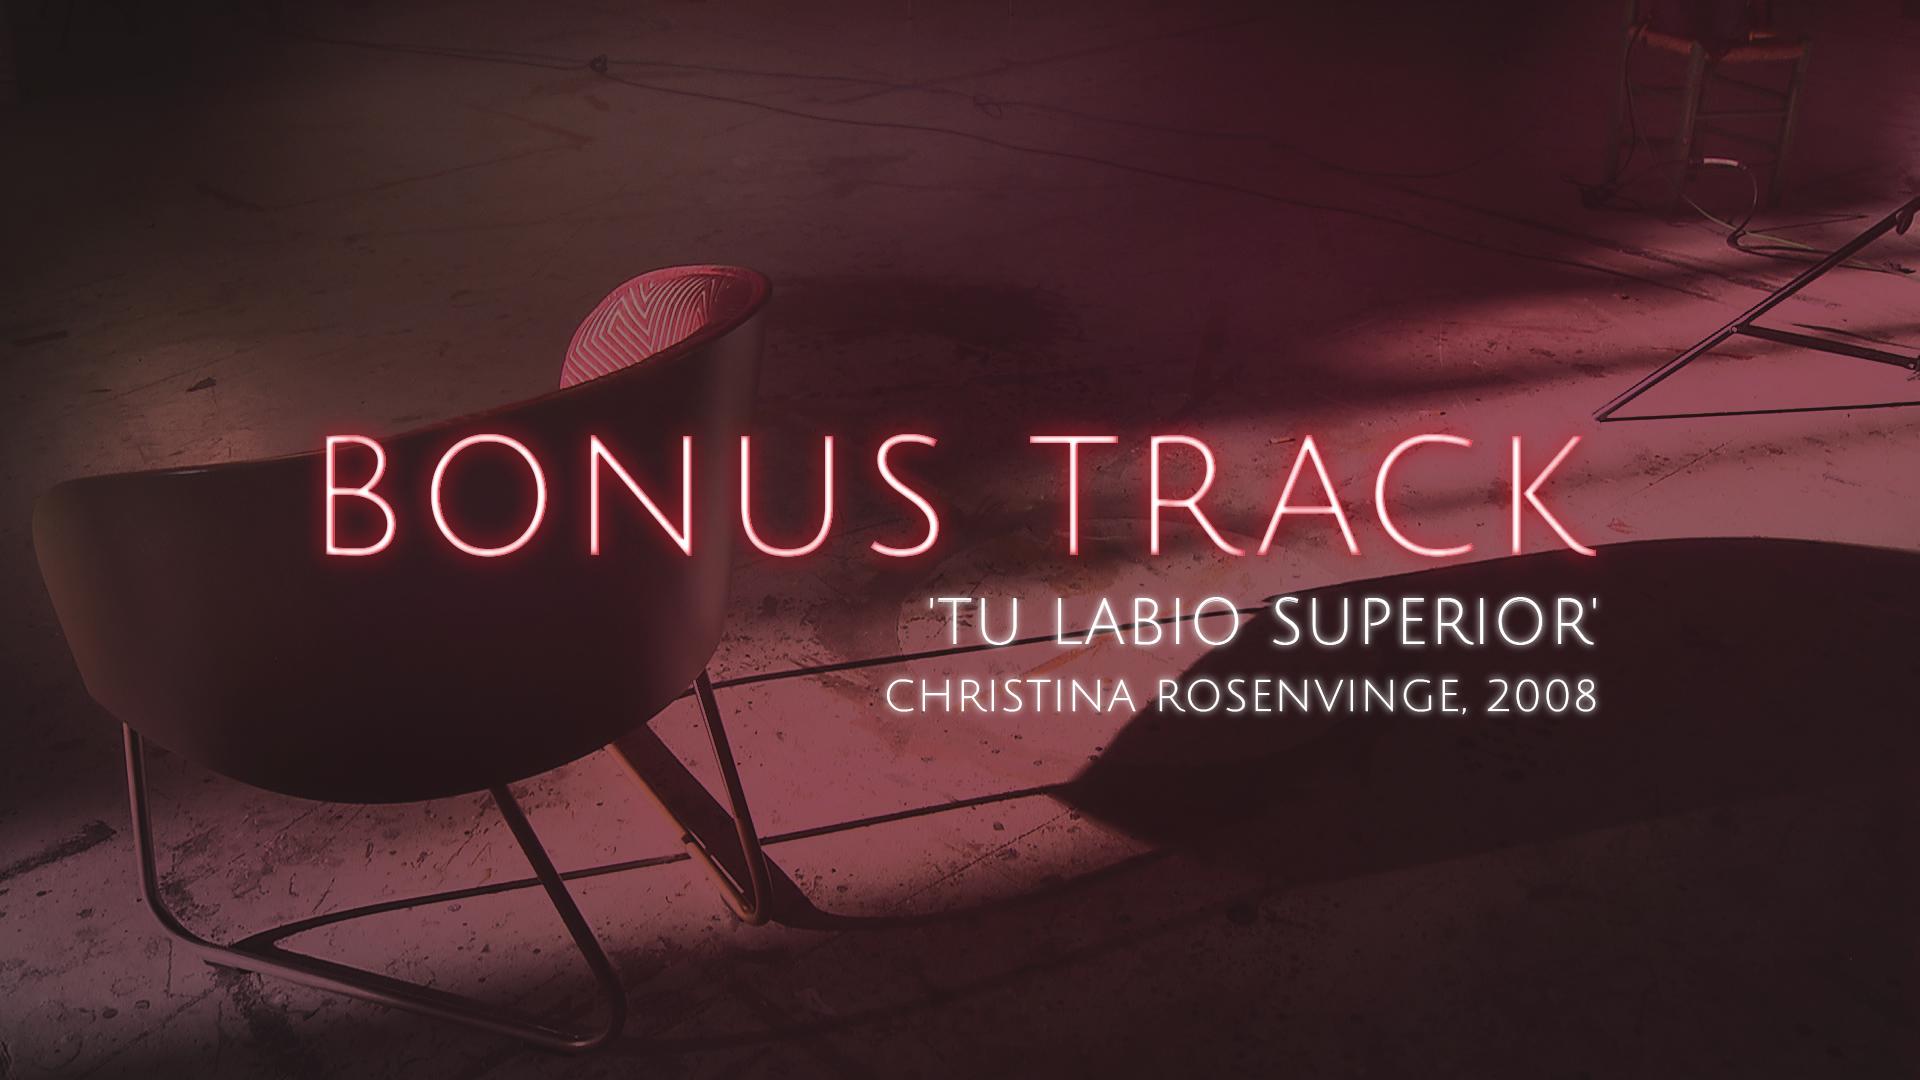 Bonus Track - 'Tu labio superior', Christina Rosenvinge (Teaser) - 06/10/17